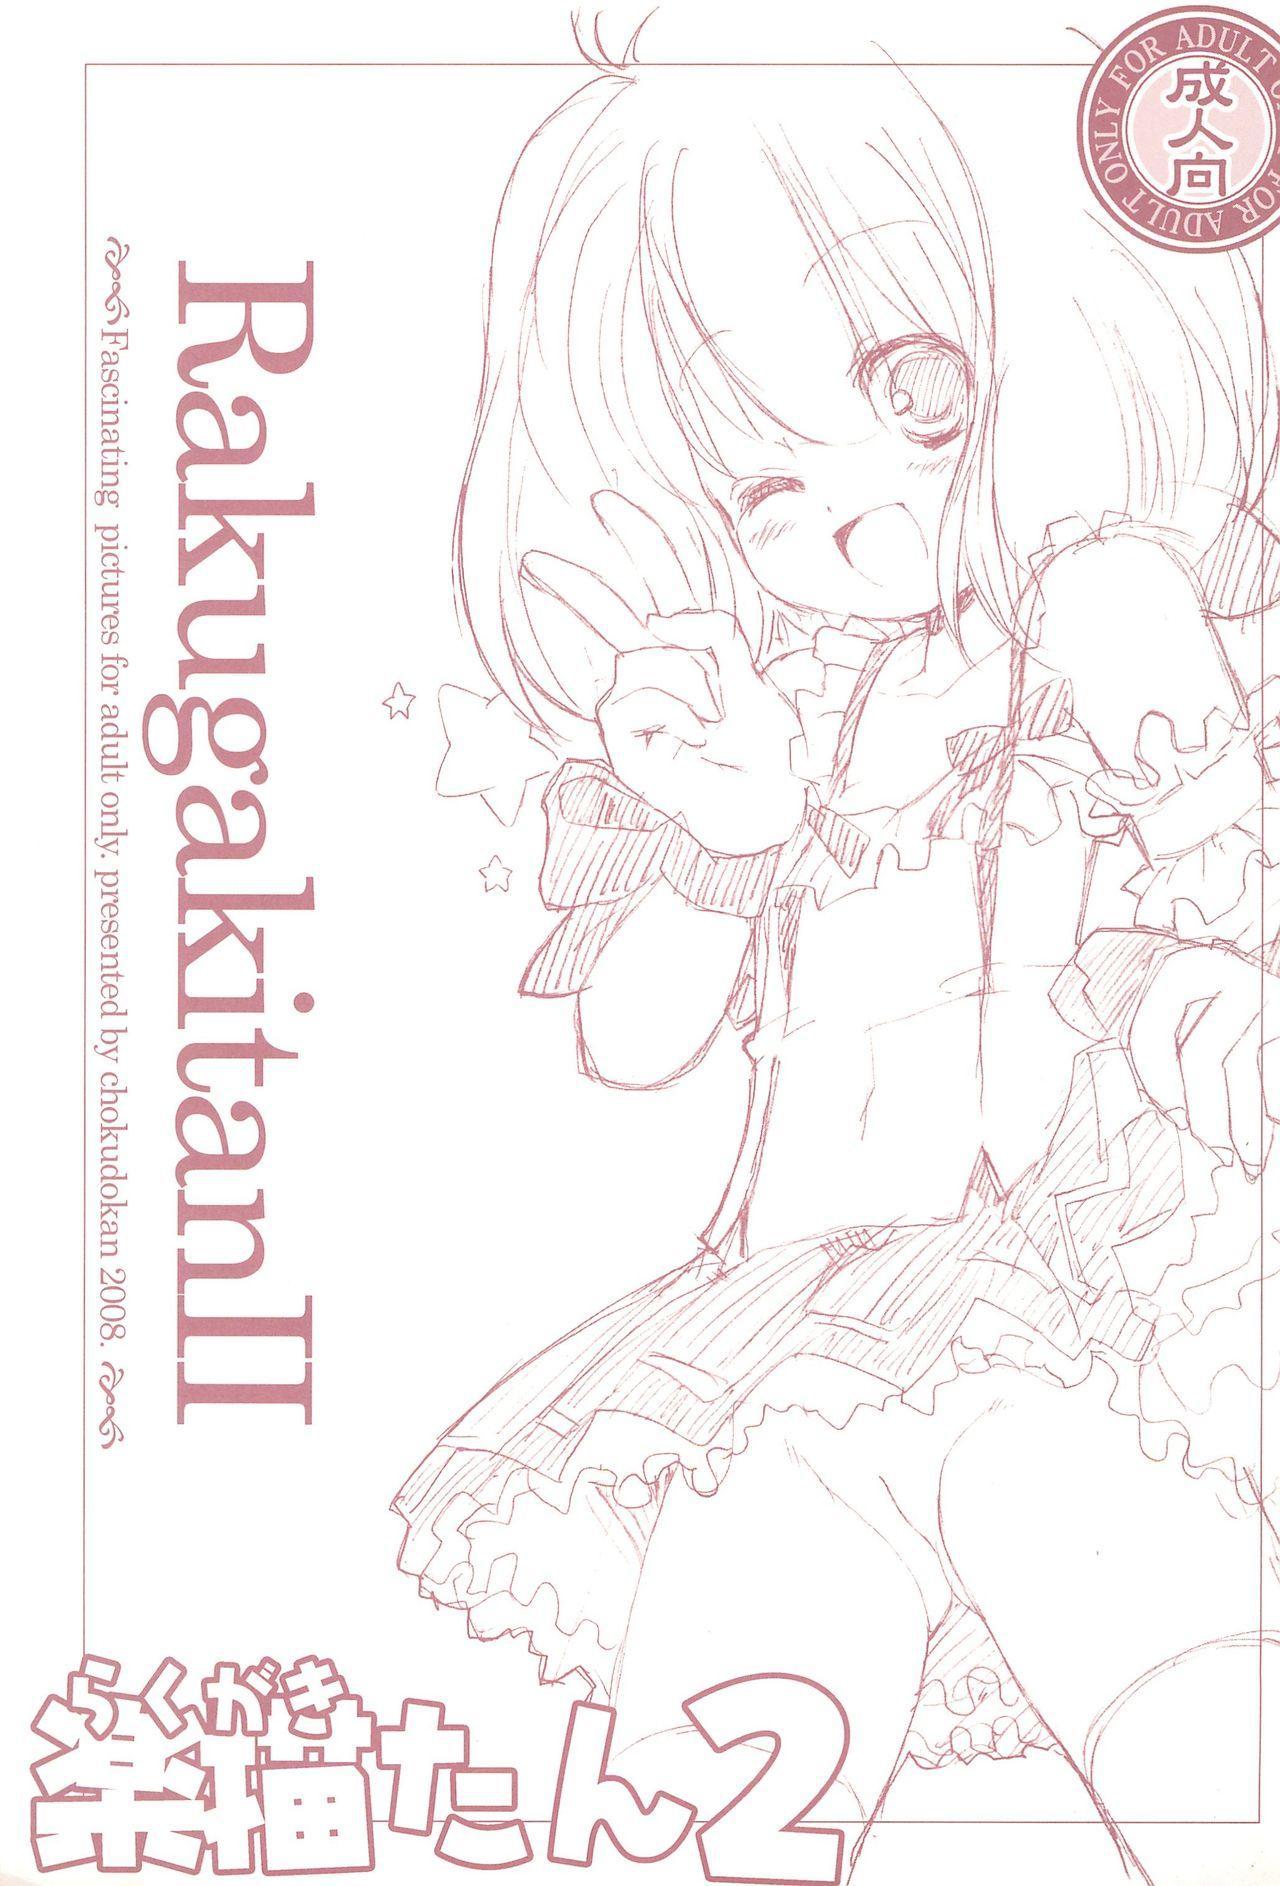 (Puniket 18) [Chokudokan (MARCY Dog, Hormone Koijirou) Rakugakitan 2 (Various) 0